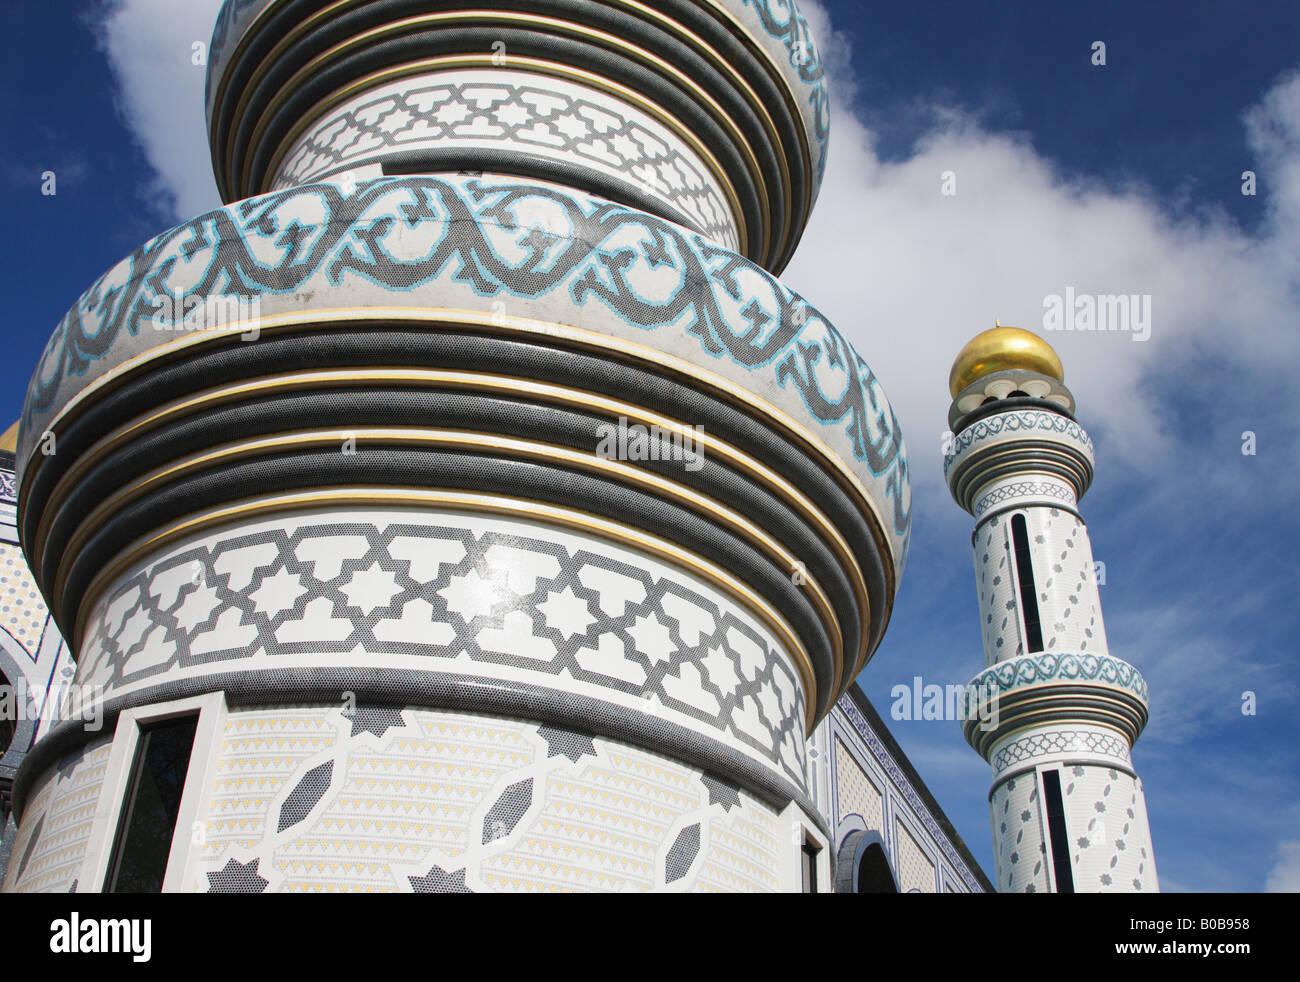 Towers Of Jame'asr Hassanal Bolkiah Mosque, Brunei - Stock Image